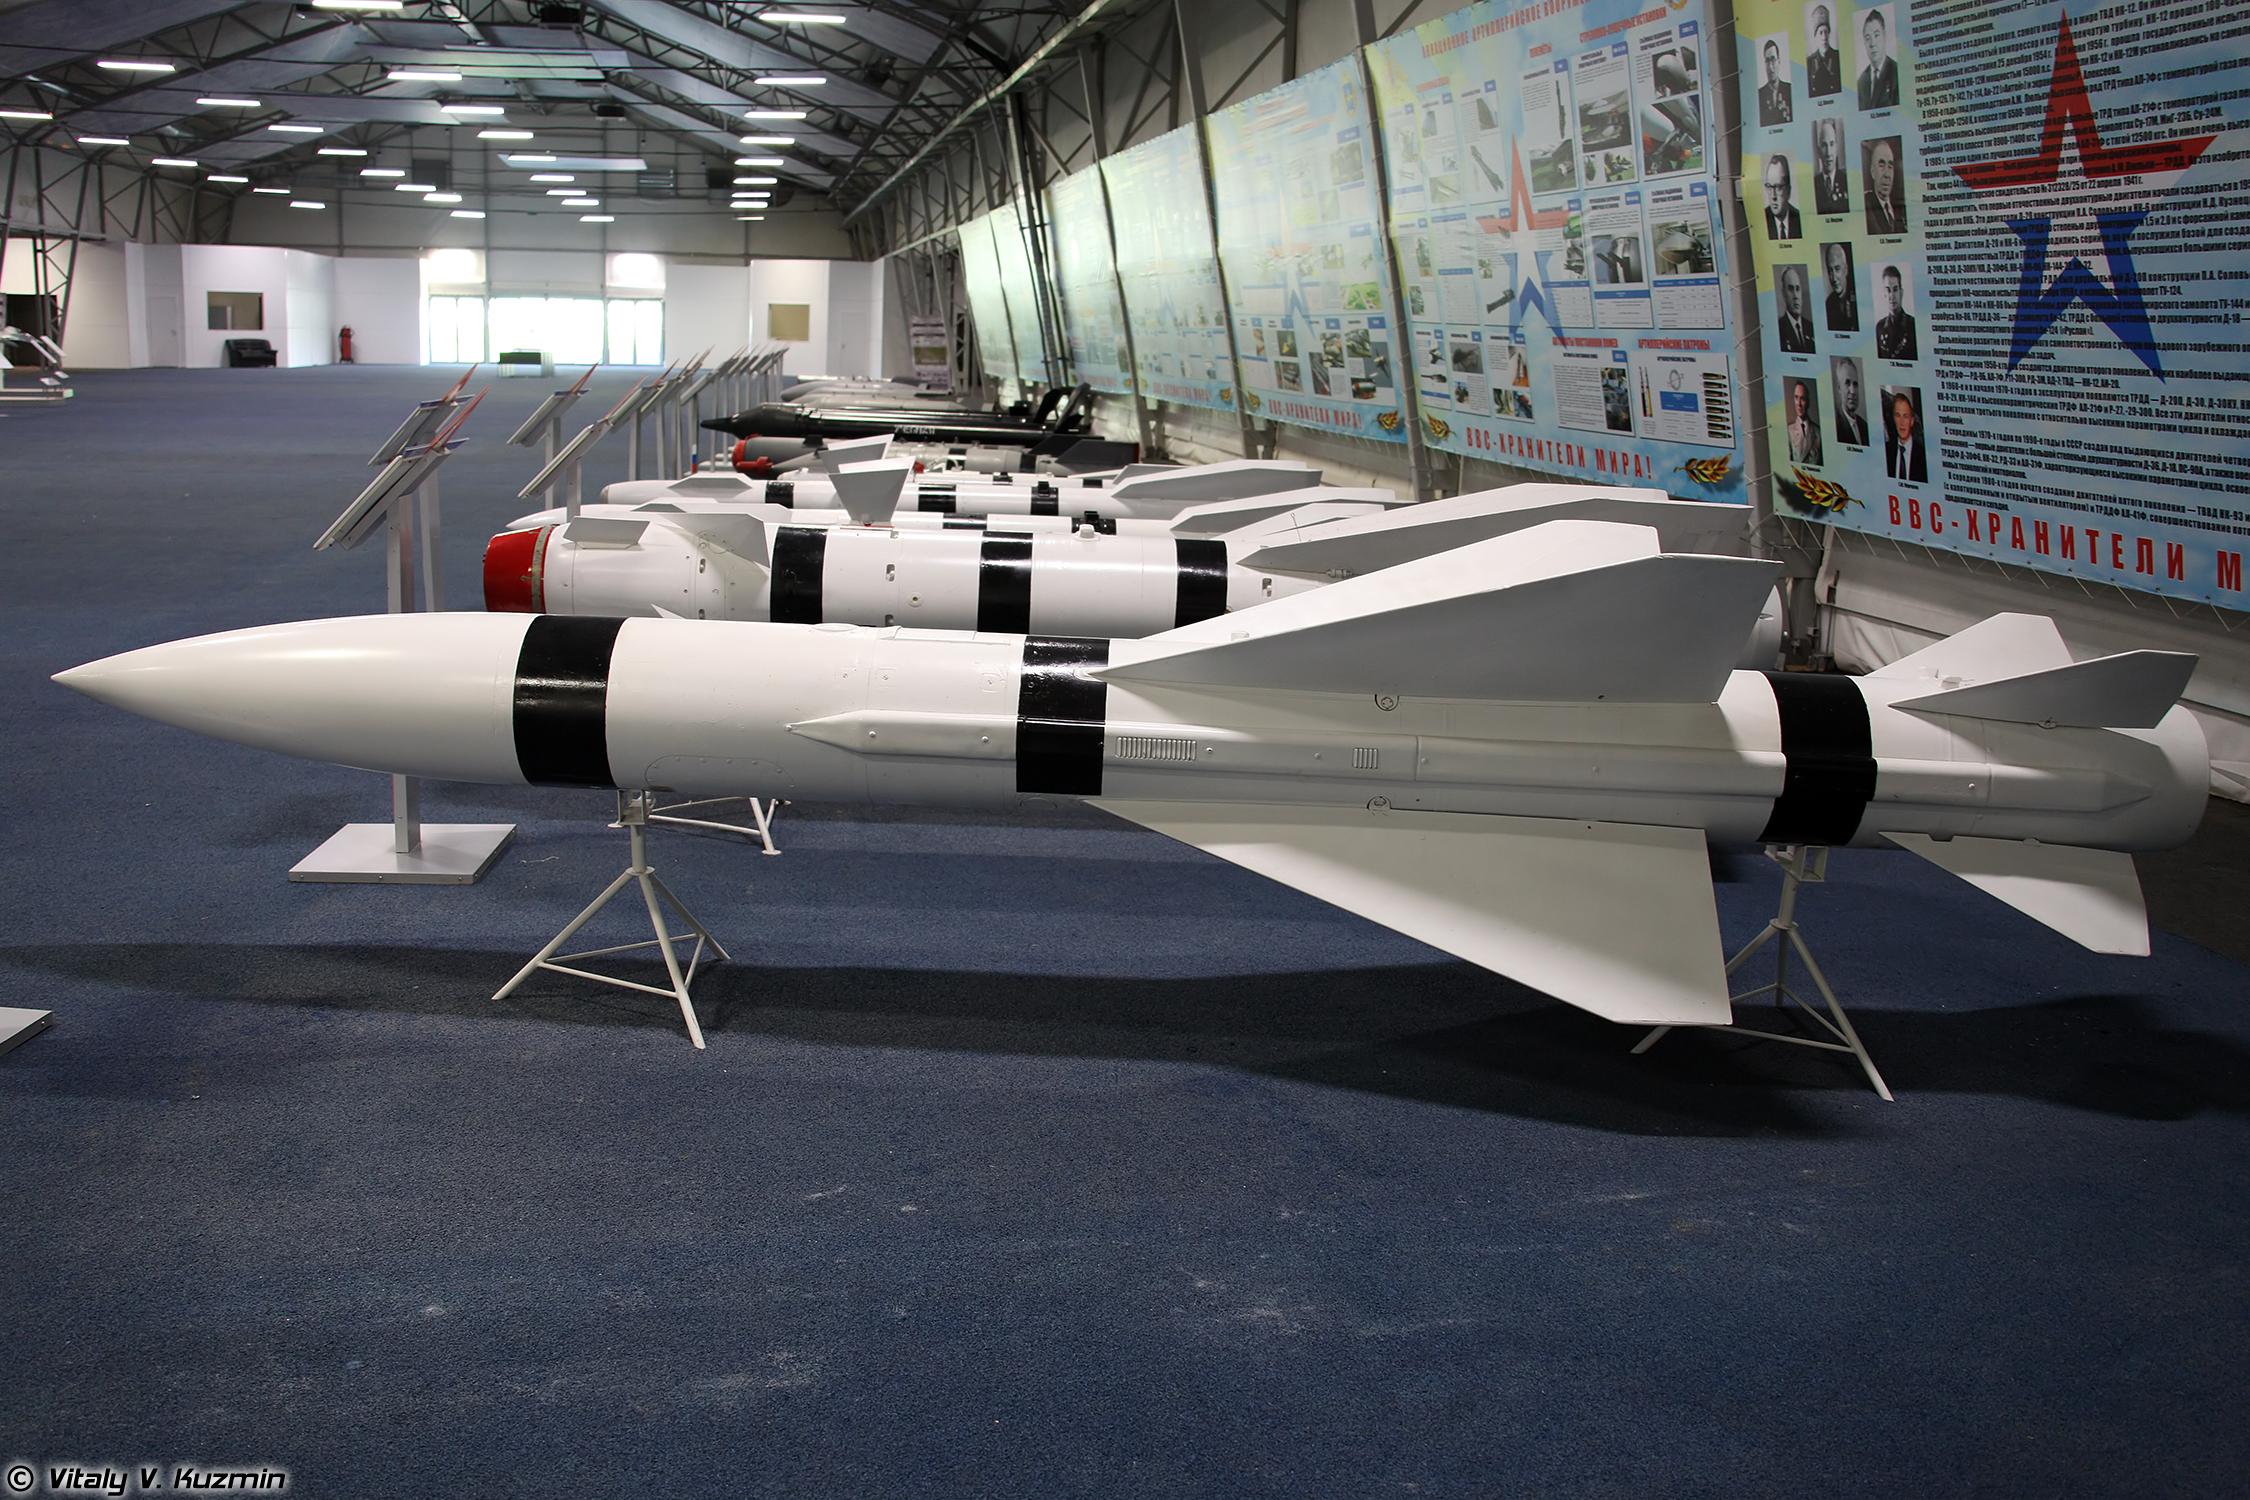 File:Kh-58U anti-radiation missile in Park Patriot 01.jpg - Wikimedia Commons